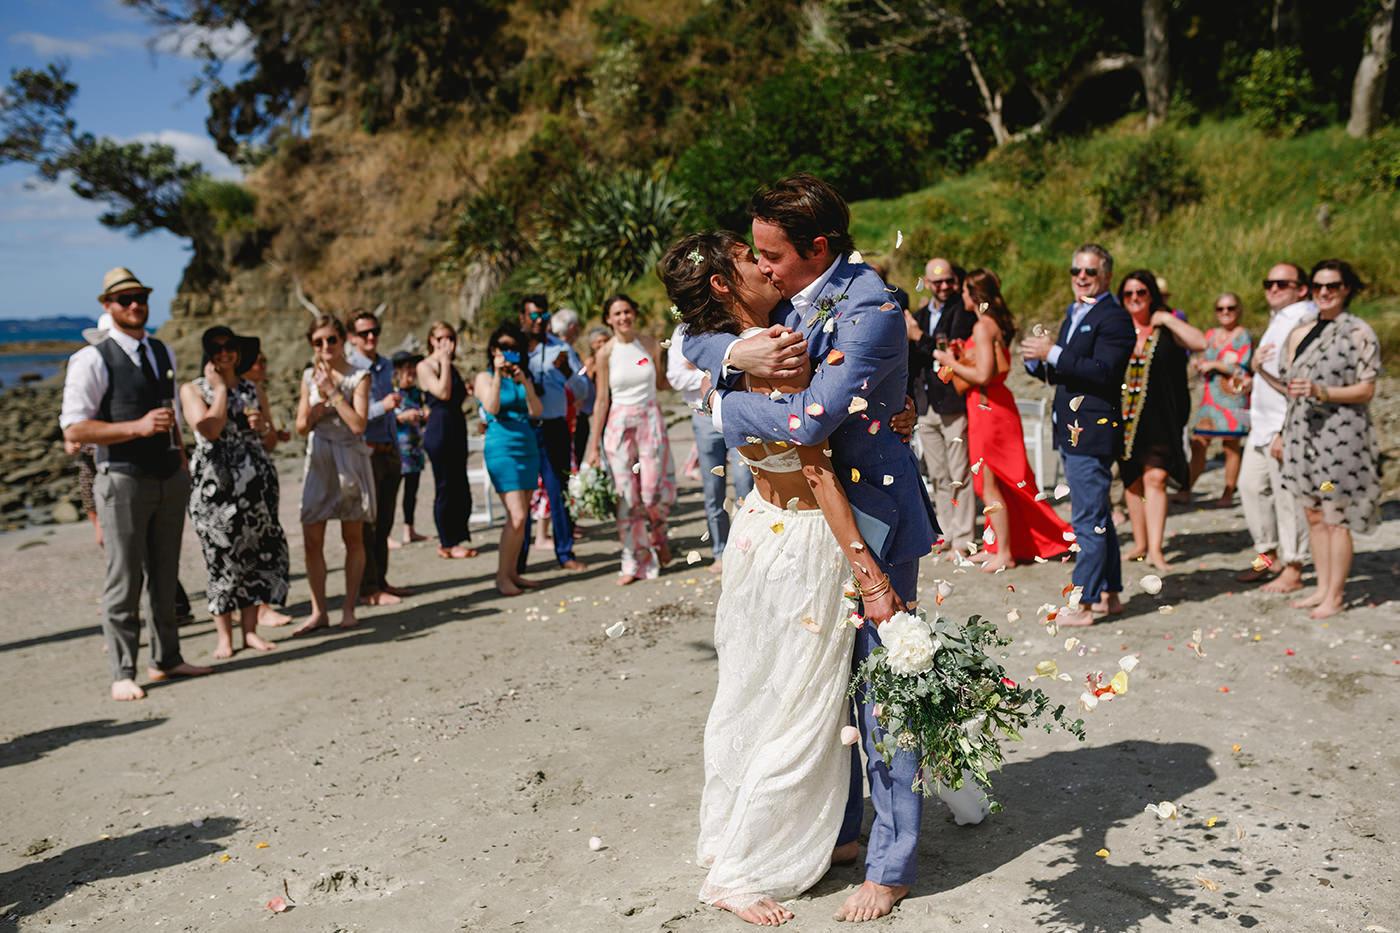 wedding_photographer_nz-00078.jpg